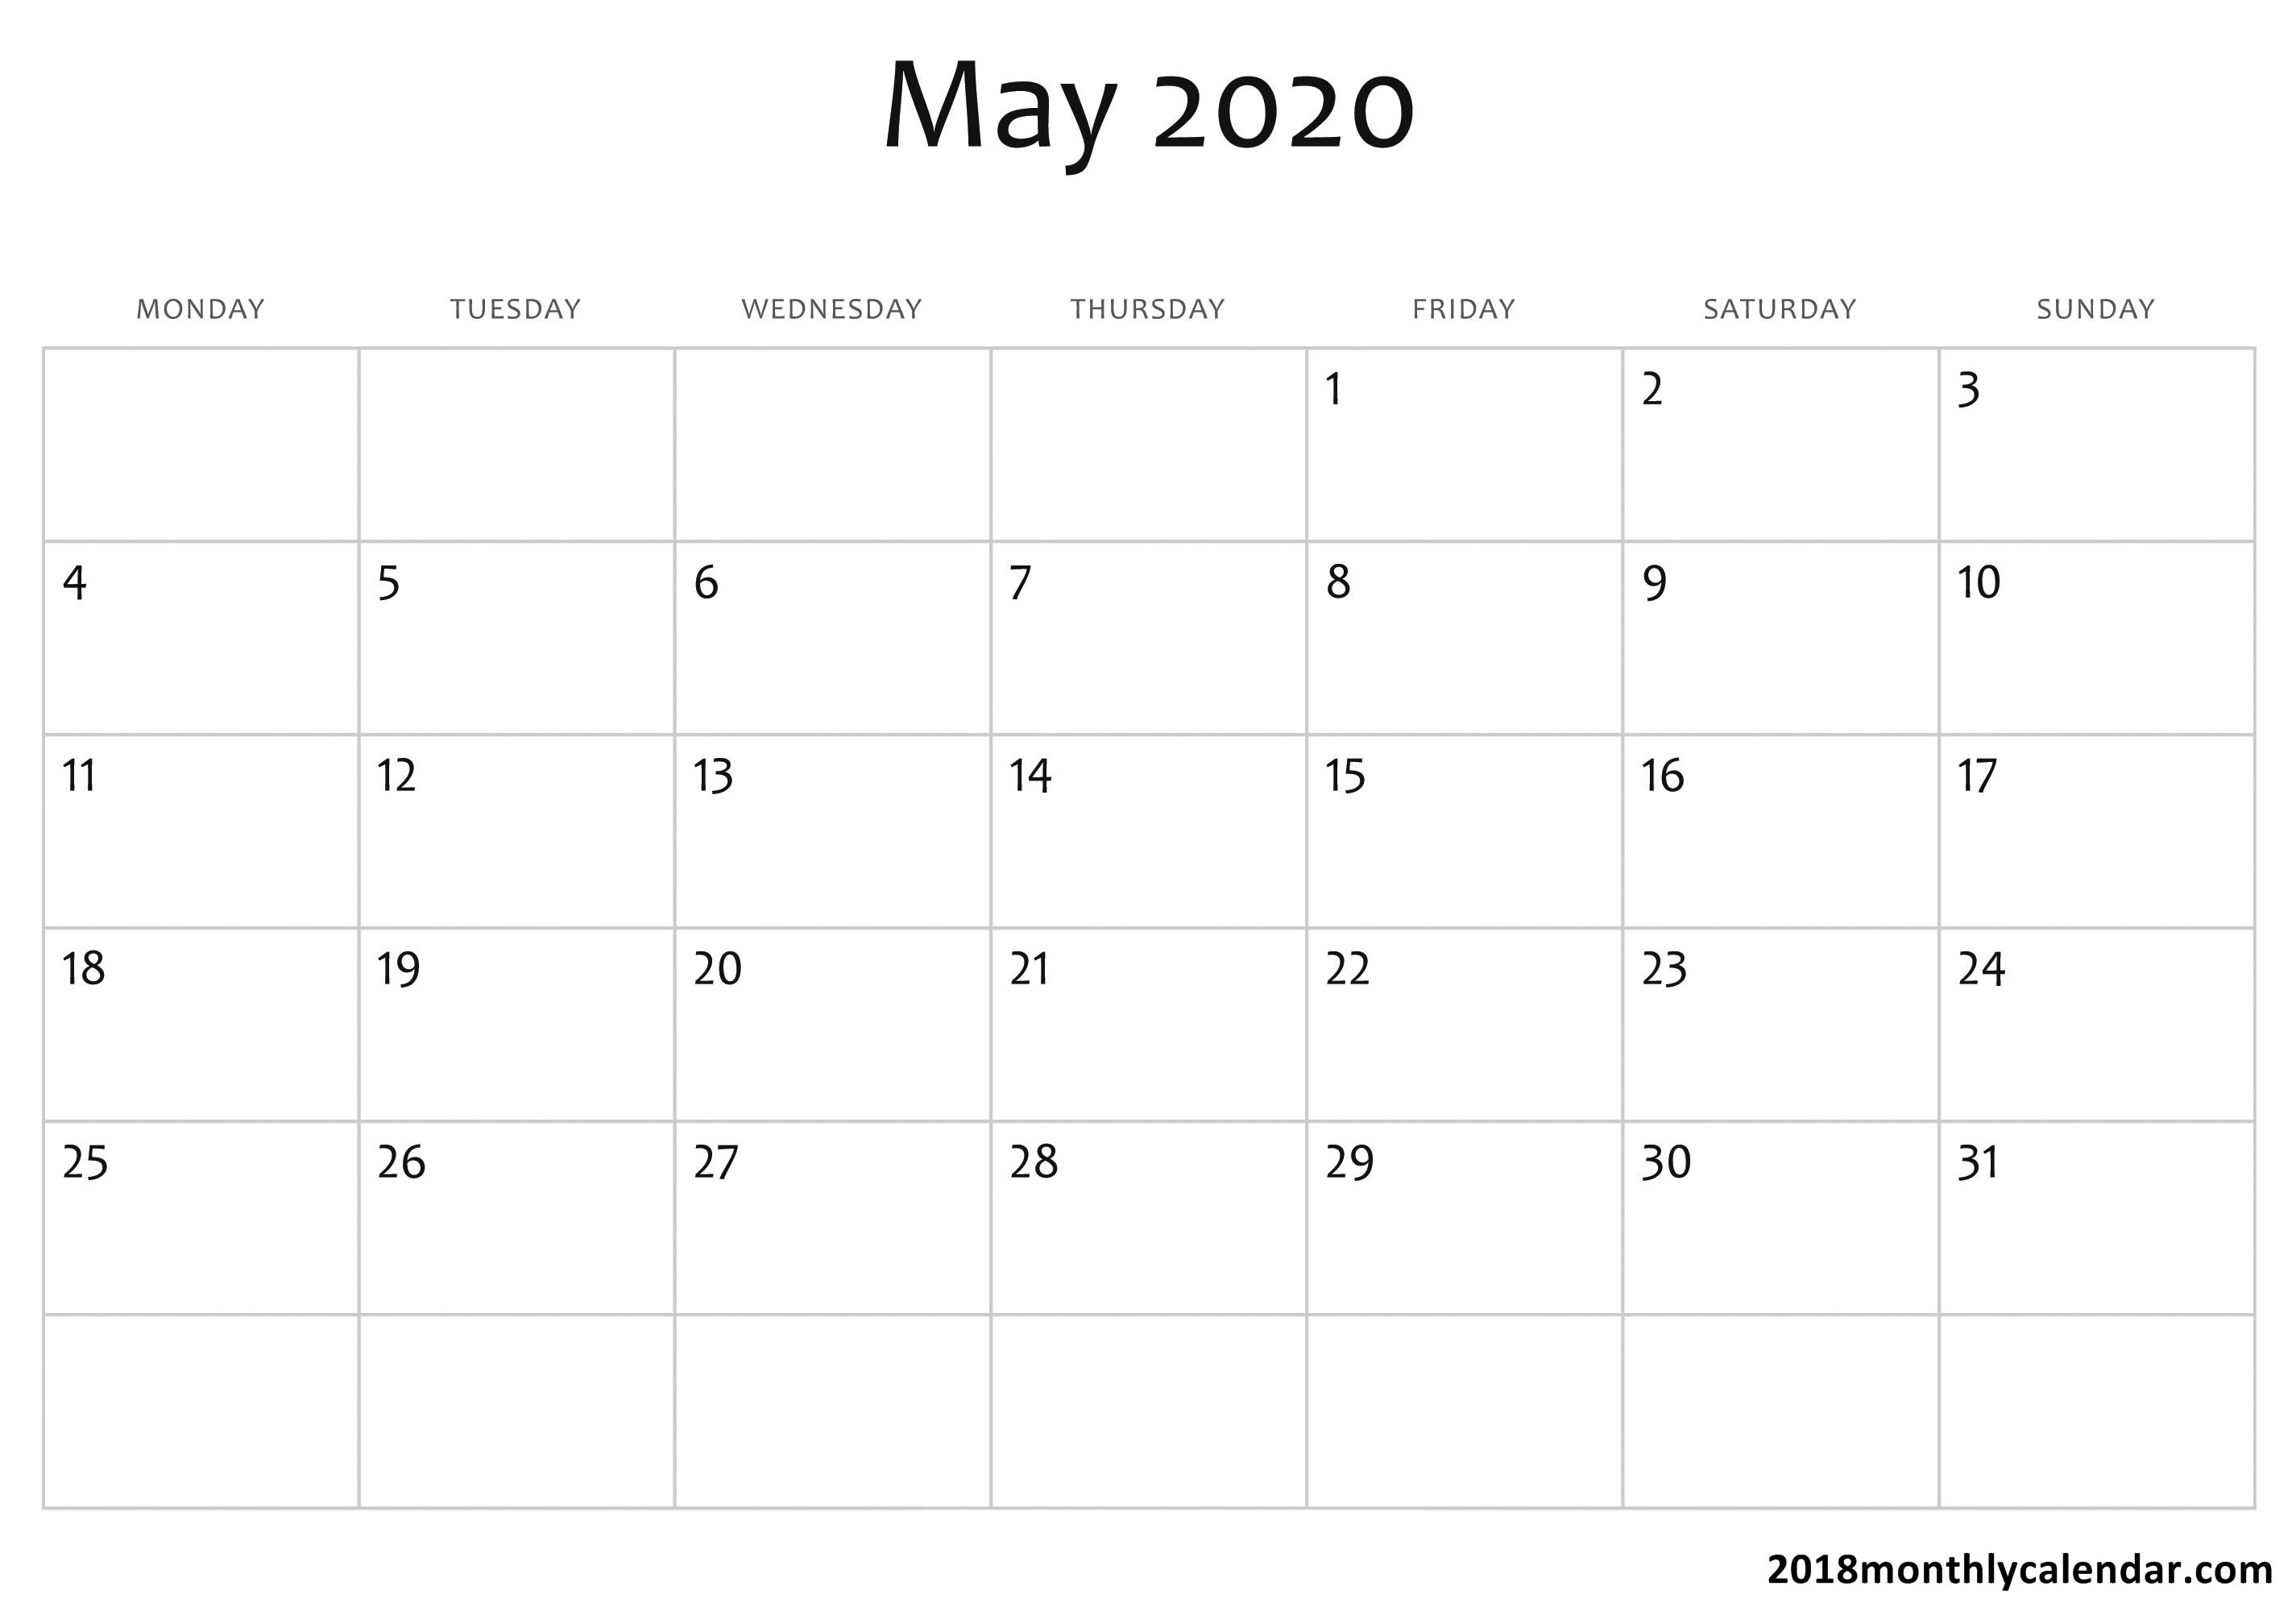 Download May 2020 Calendar – Blank & Editable